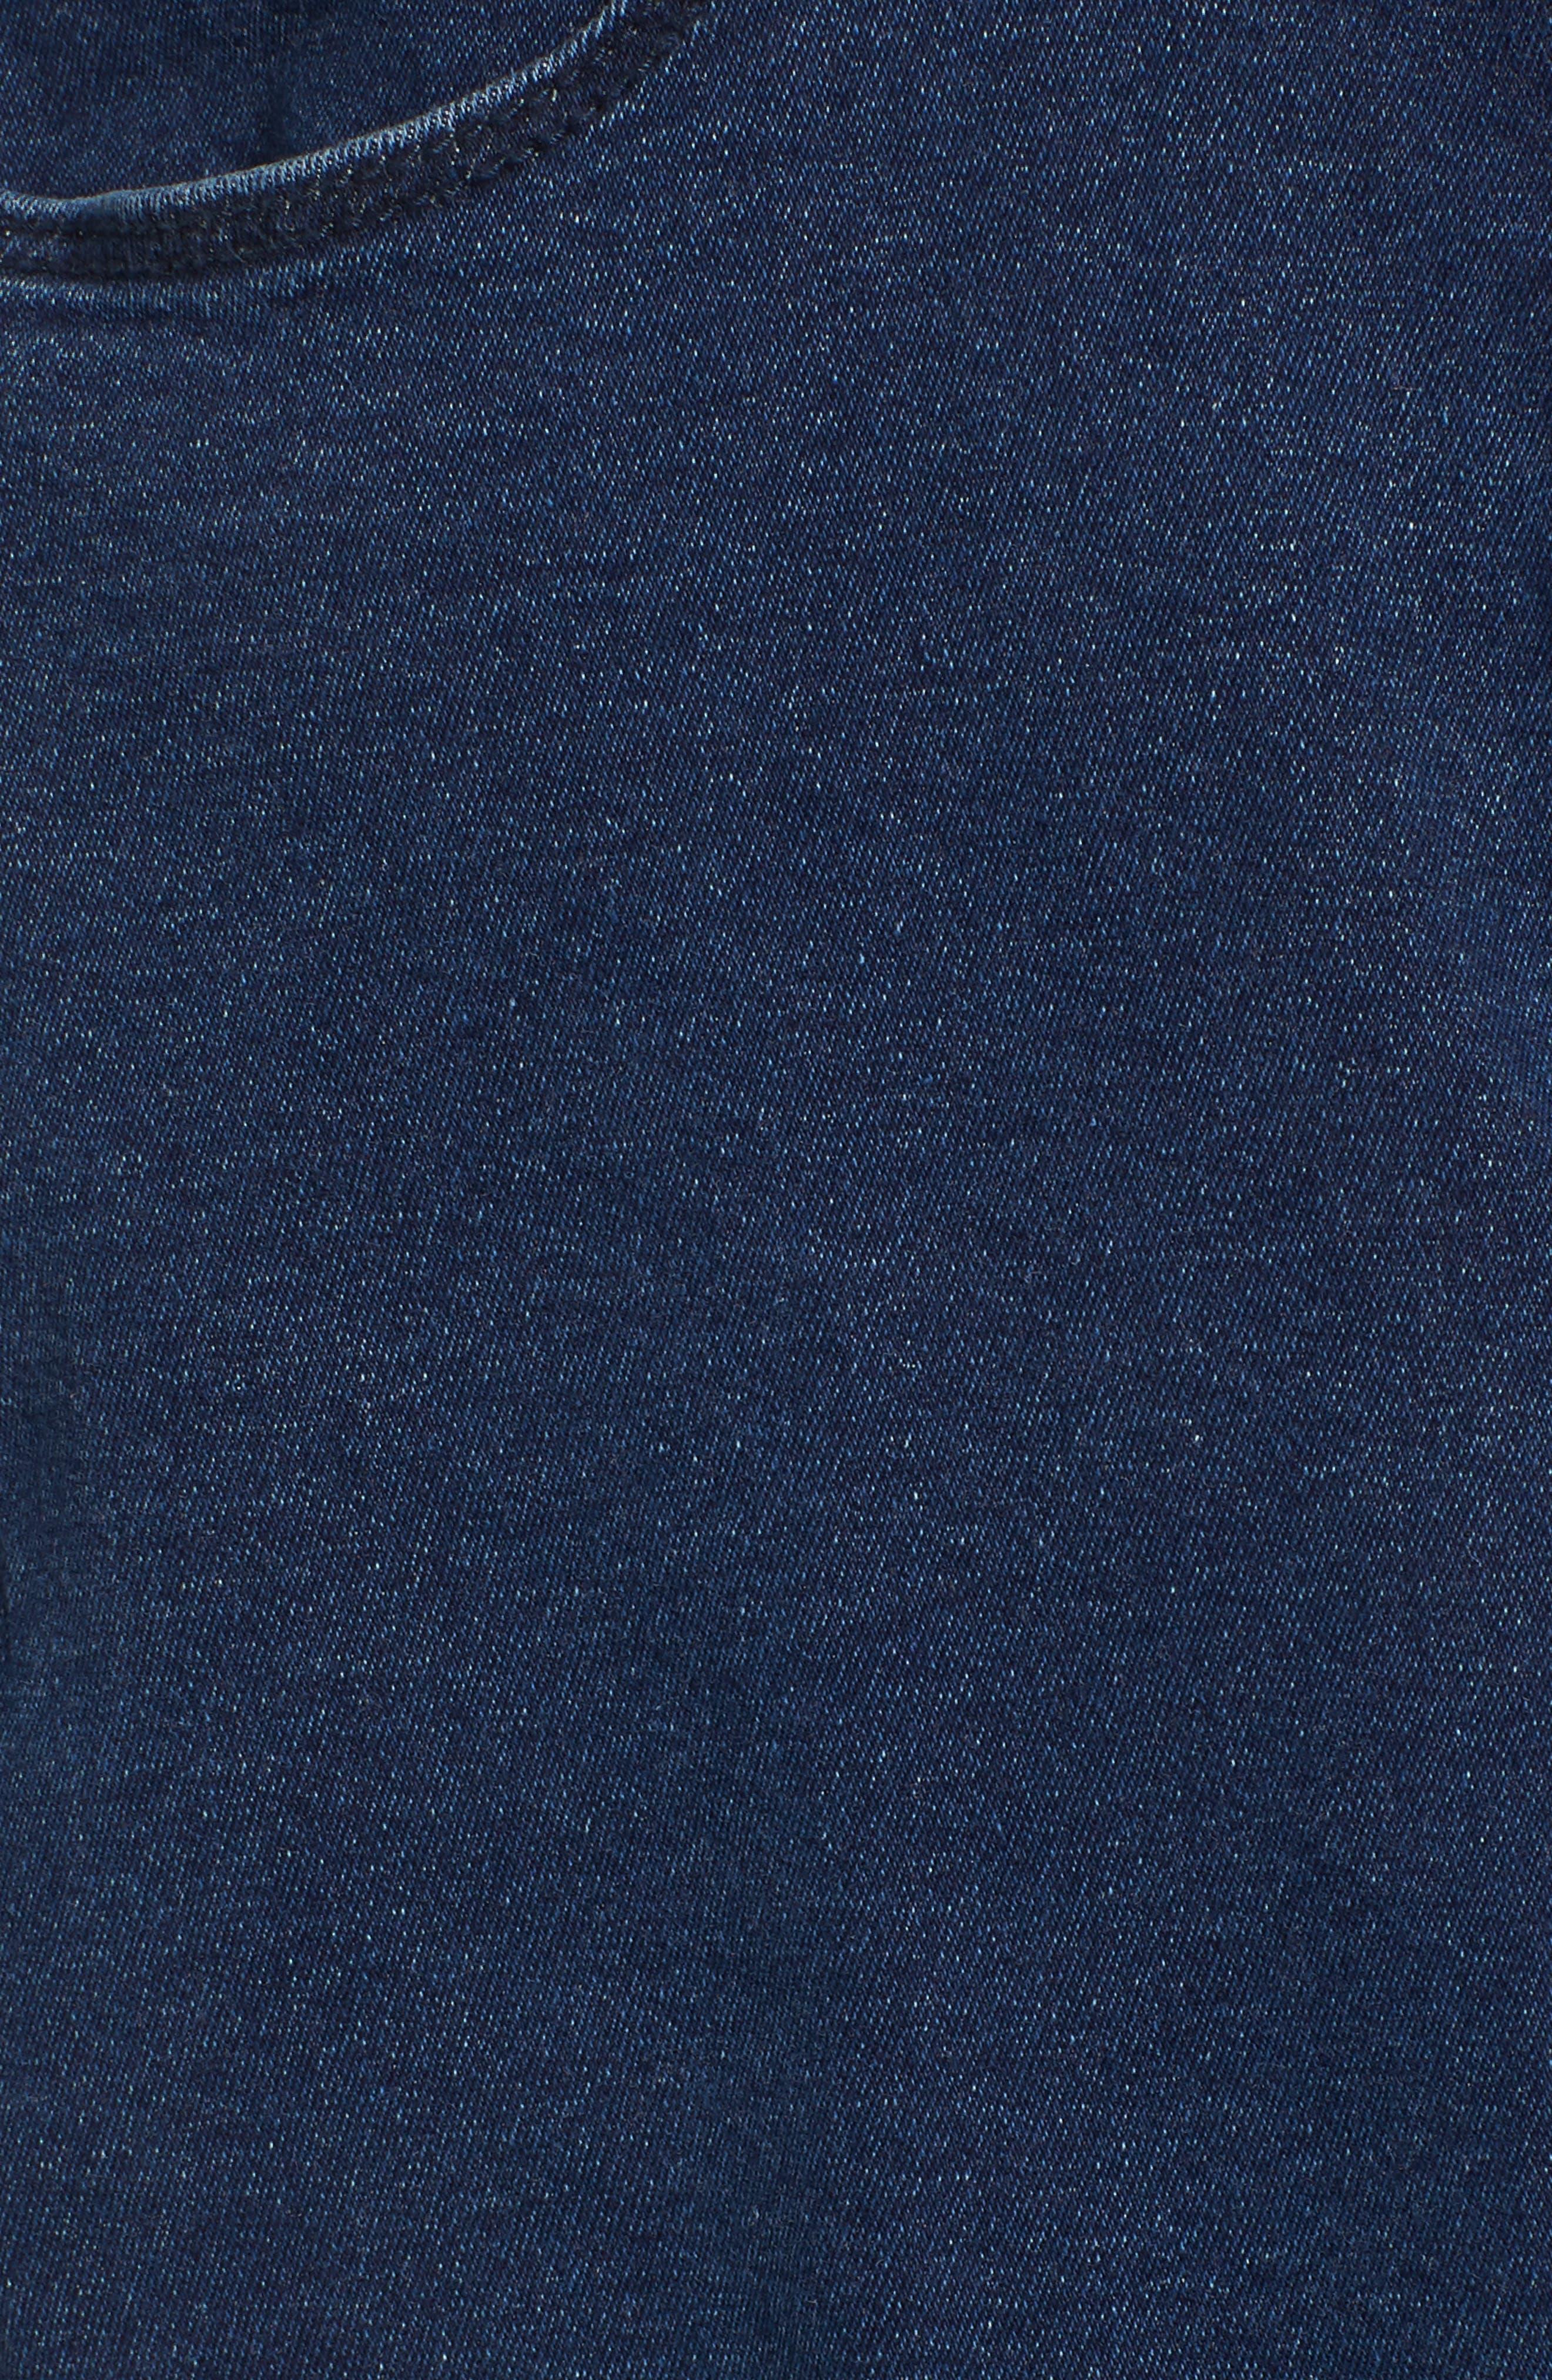 Moxy Skinny Jeans,                             Alternate thumbnail 6, color,                             400